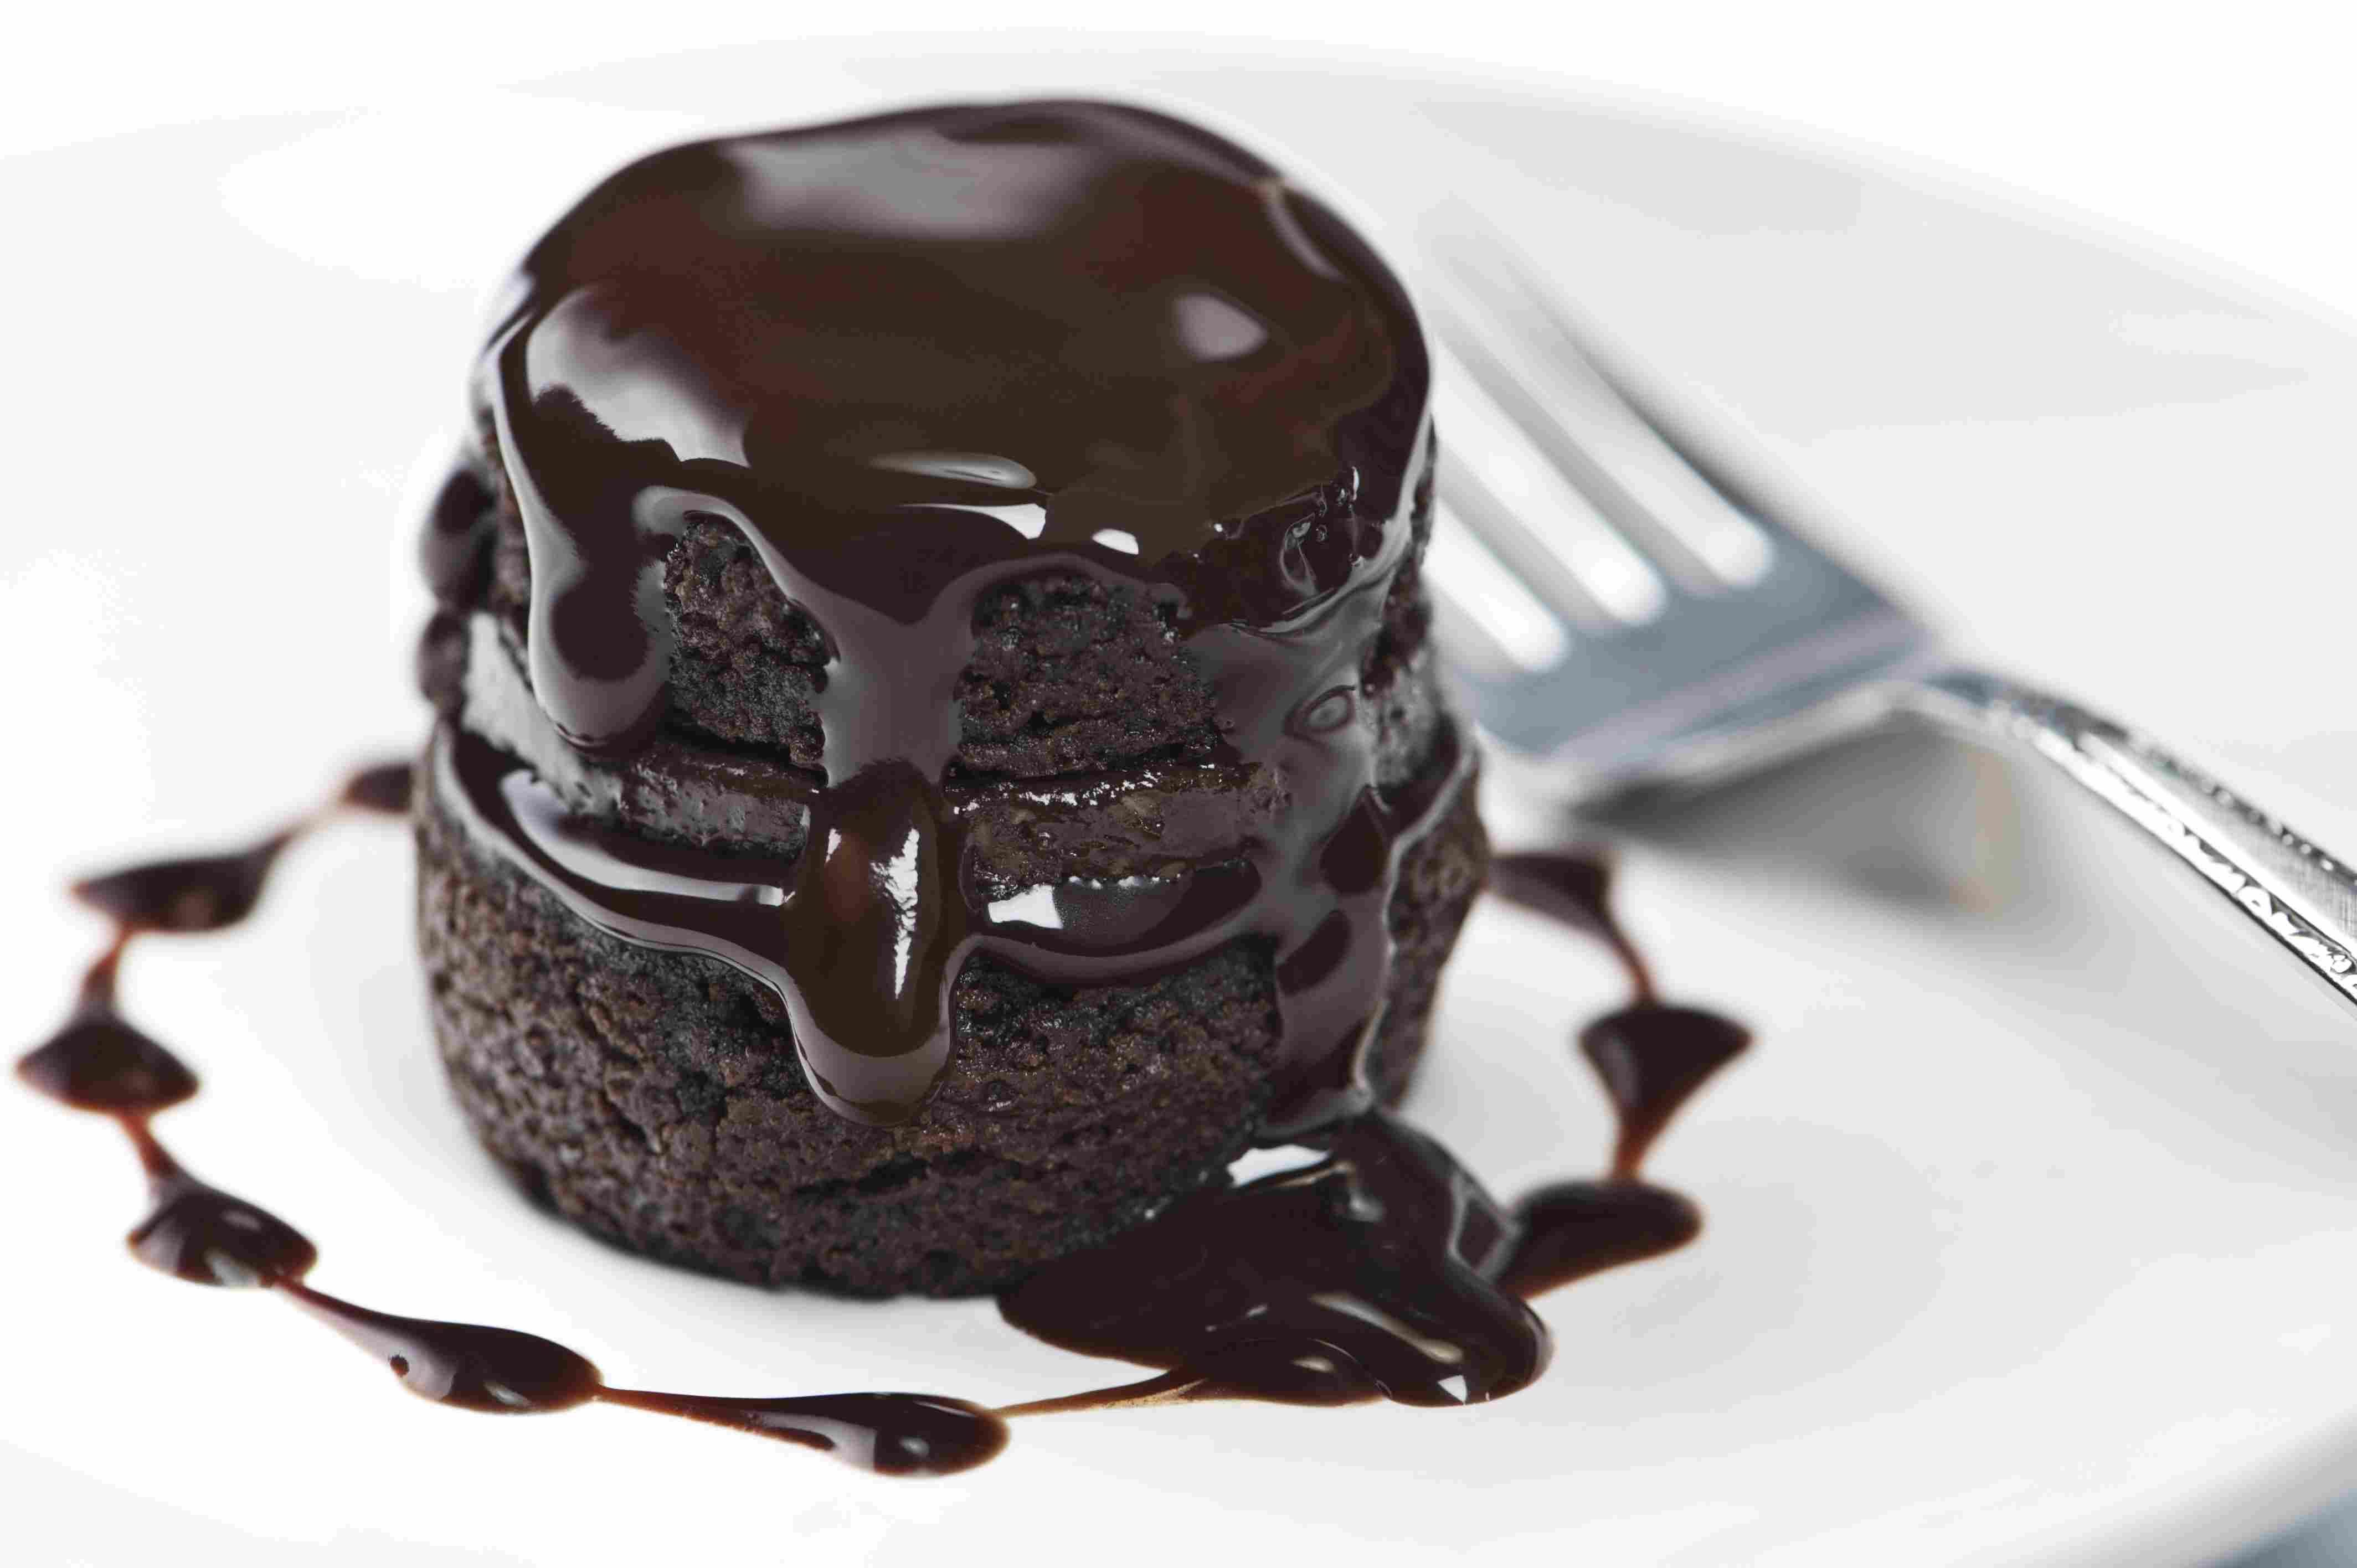 Gluten-Free Chocolate Cake With Chocolate Glaze